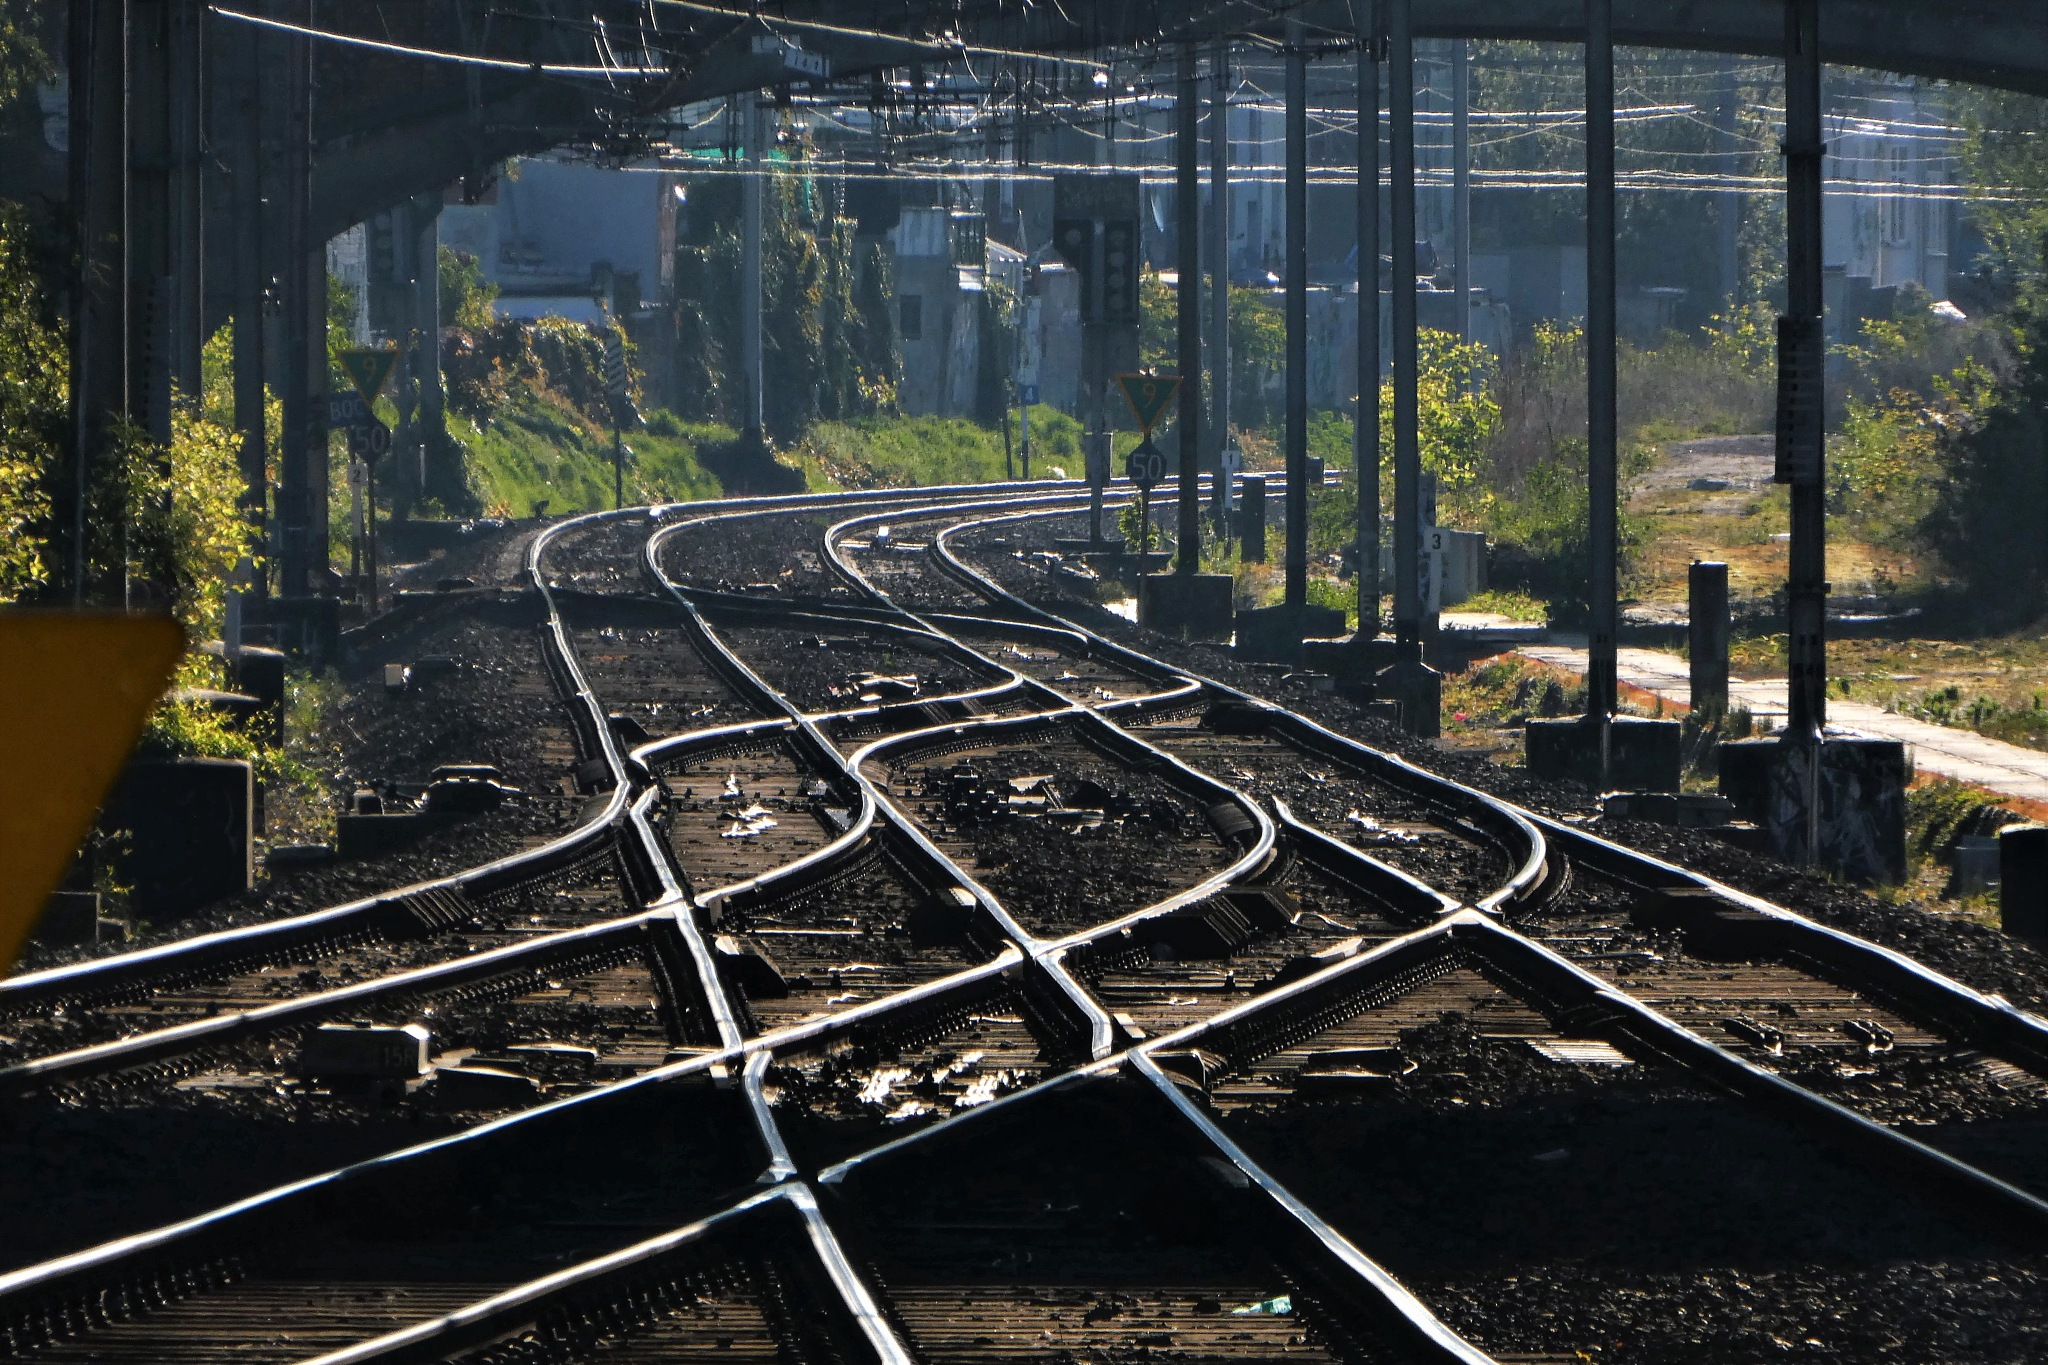 Rail Junctions by Edualc Eznad